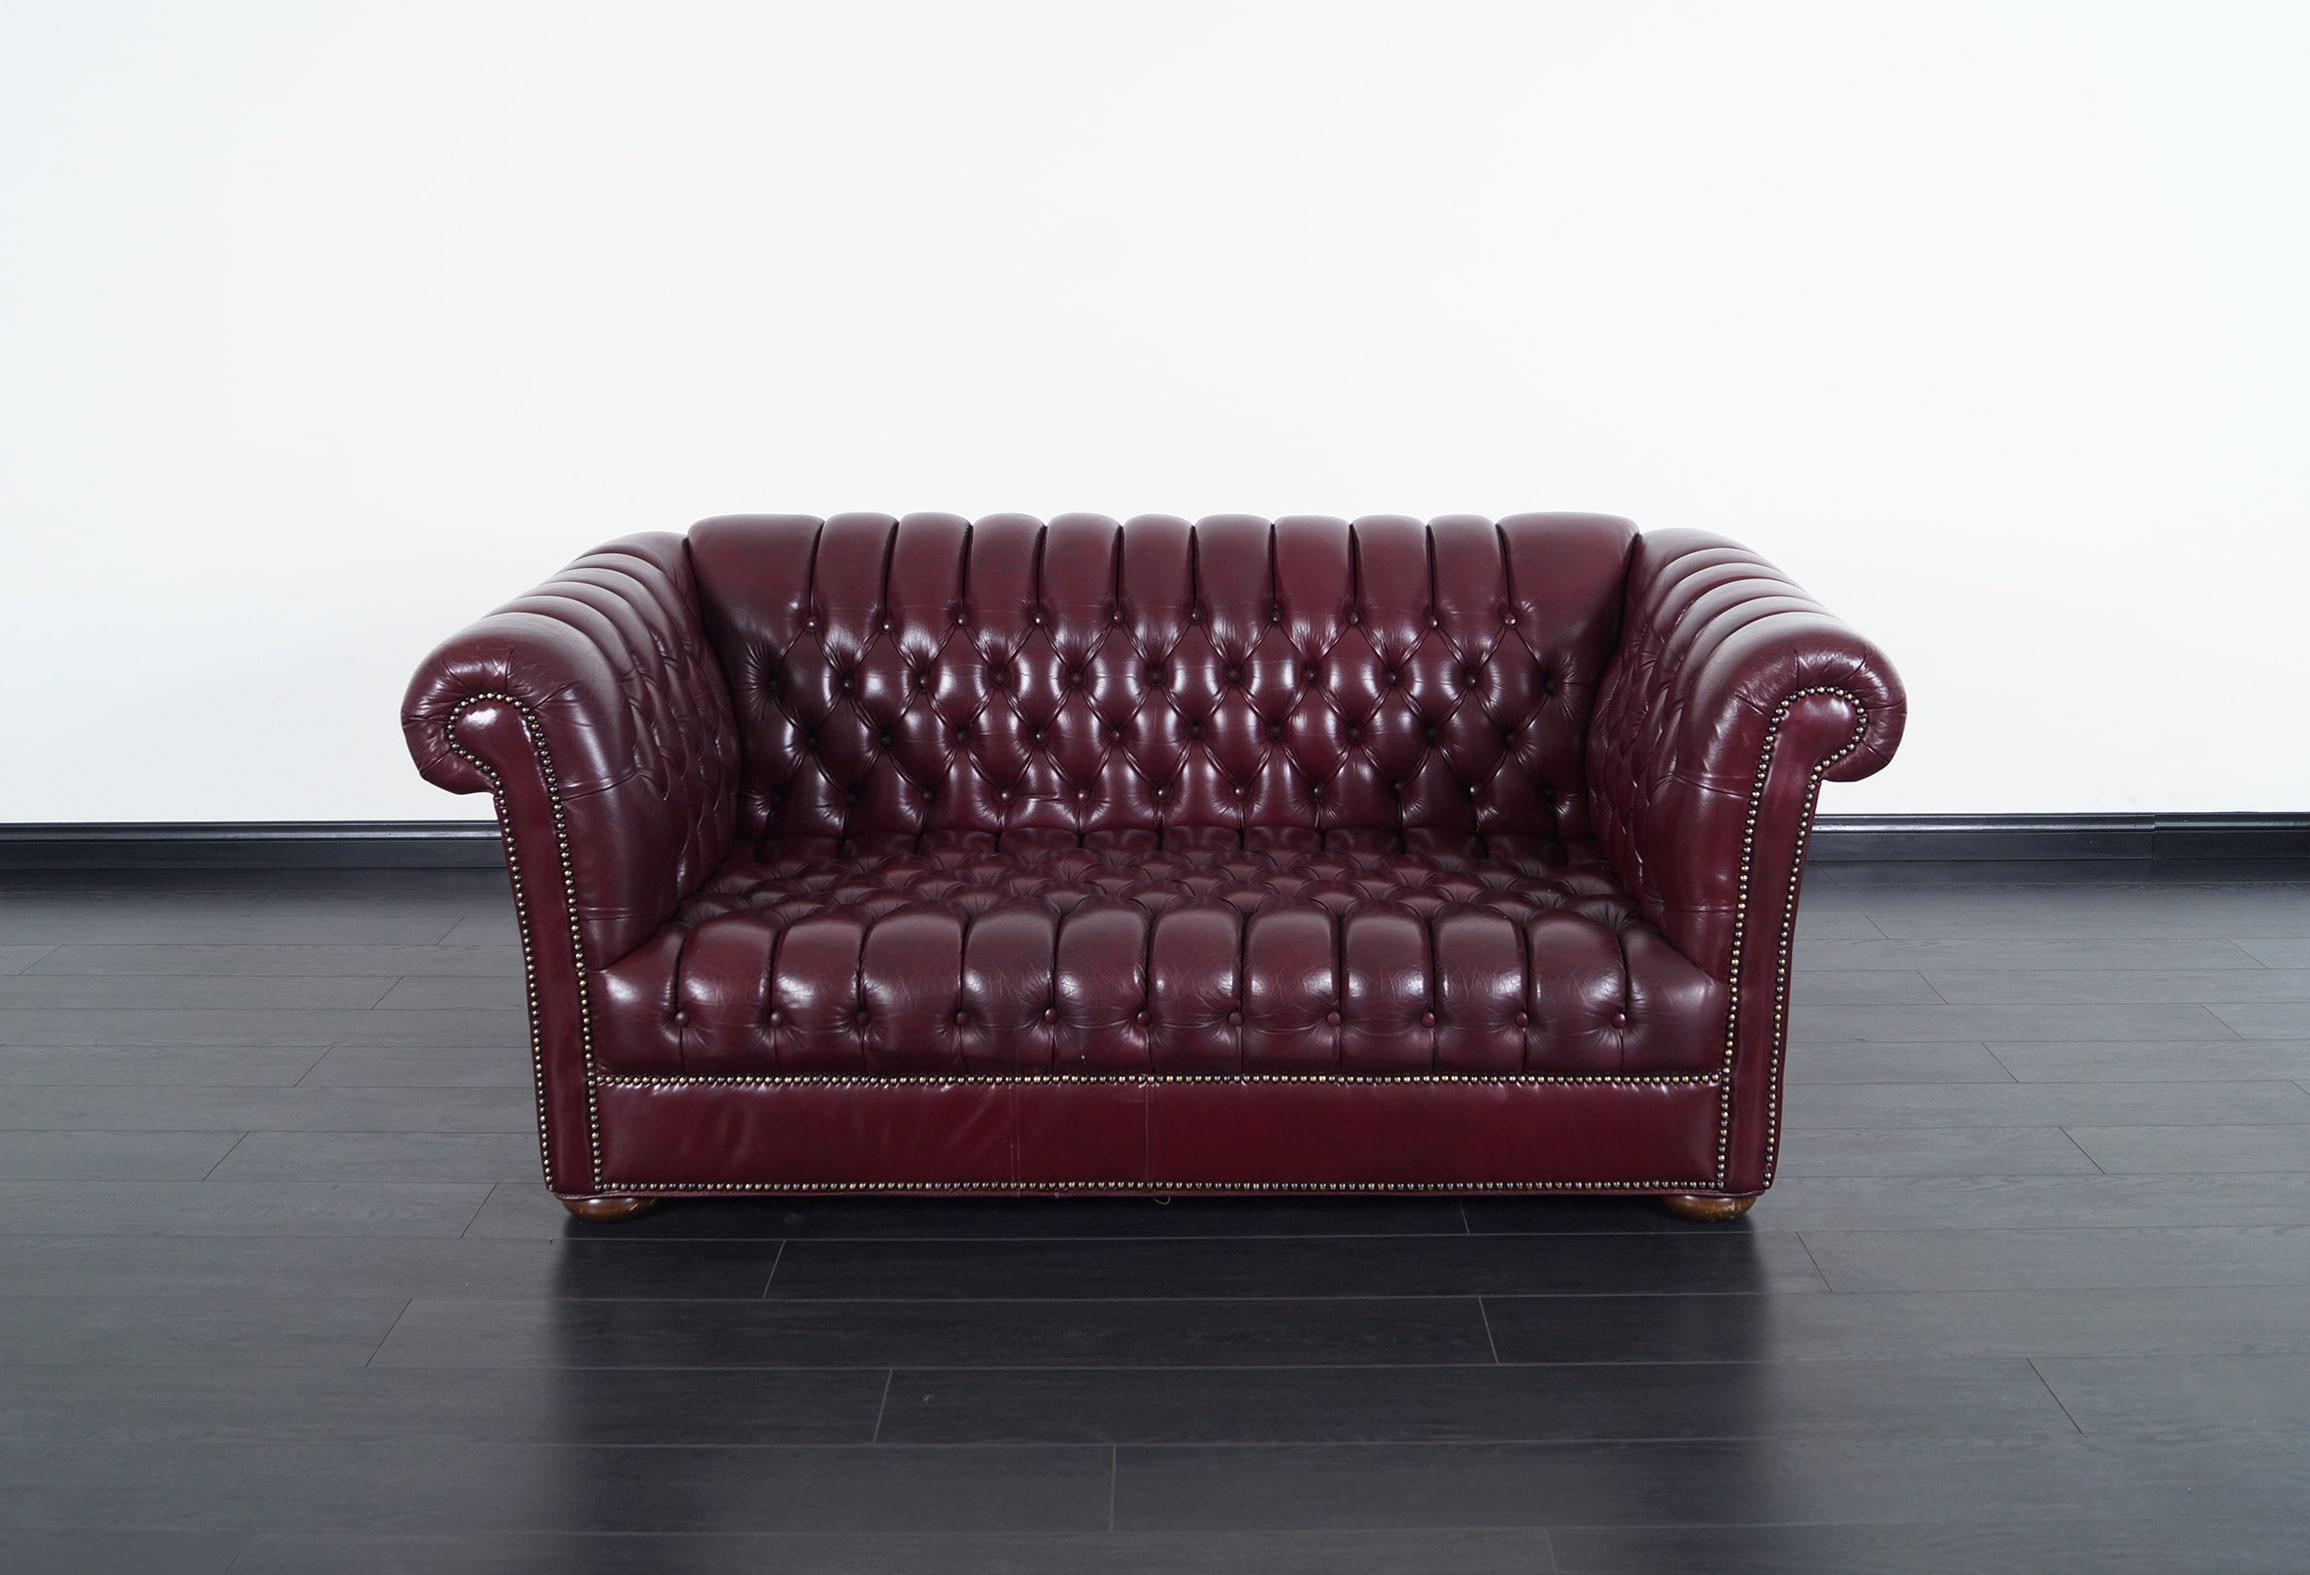 Vintage Burgundy Leather Chesterfield Loveseat